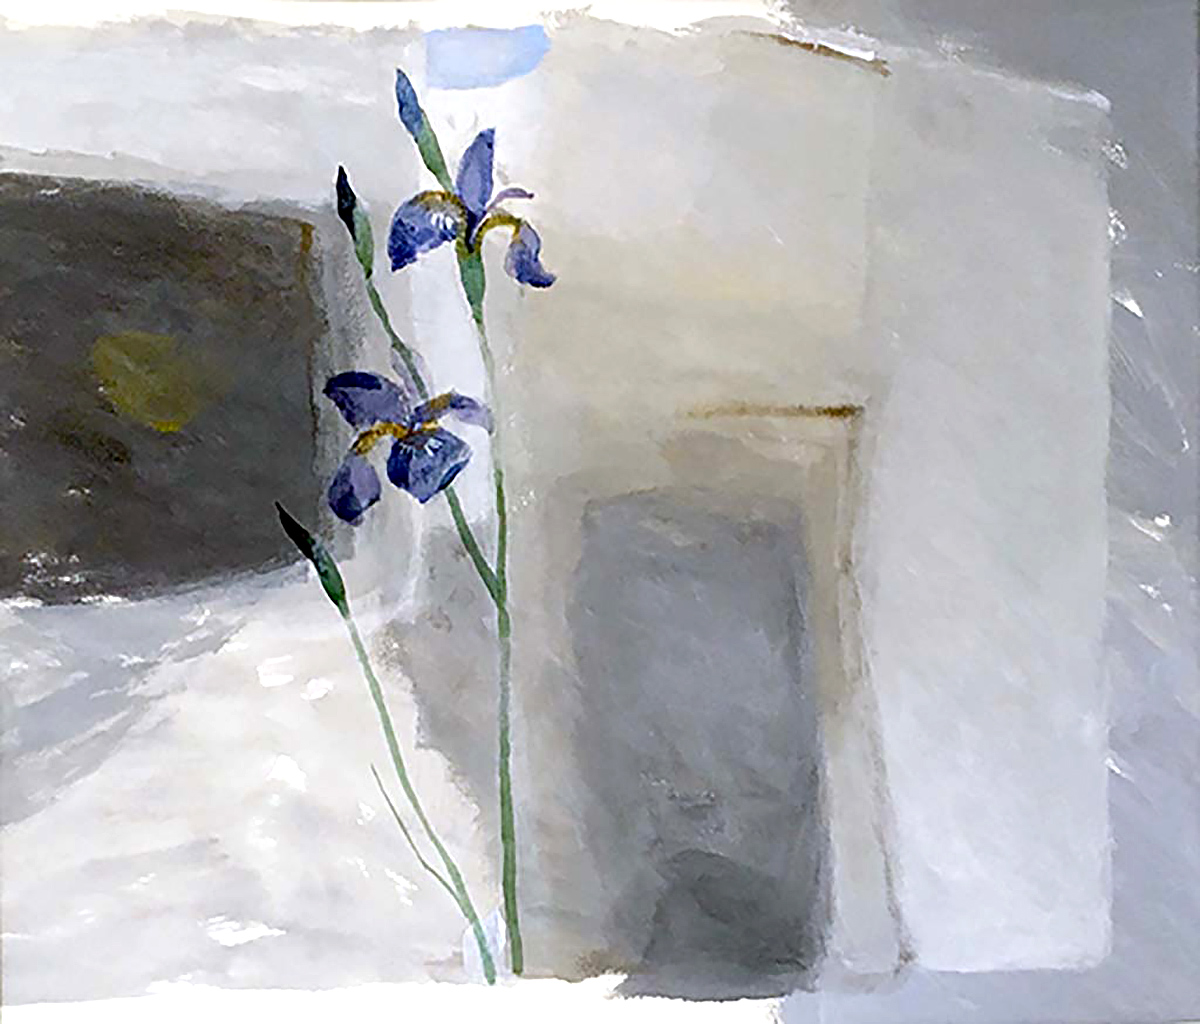 Ian Kinnear - Iris, acrylic on paper